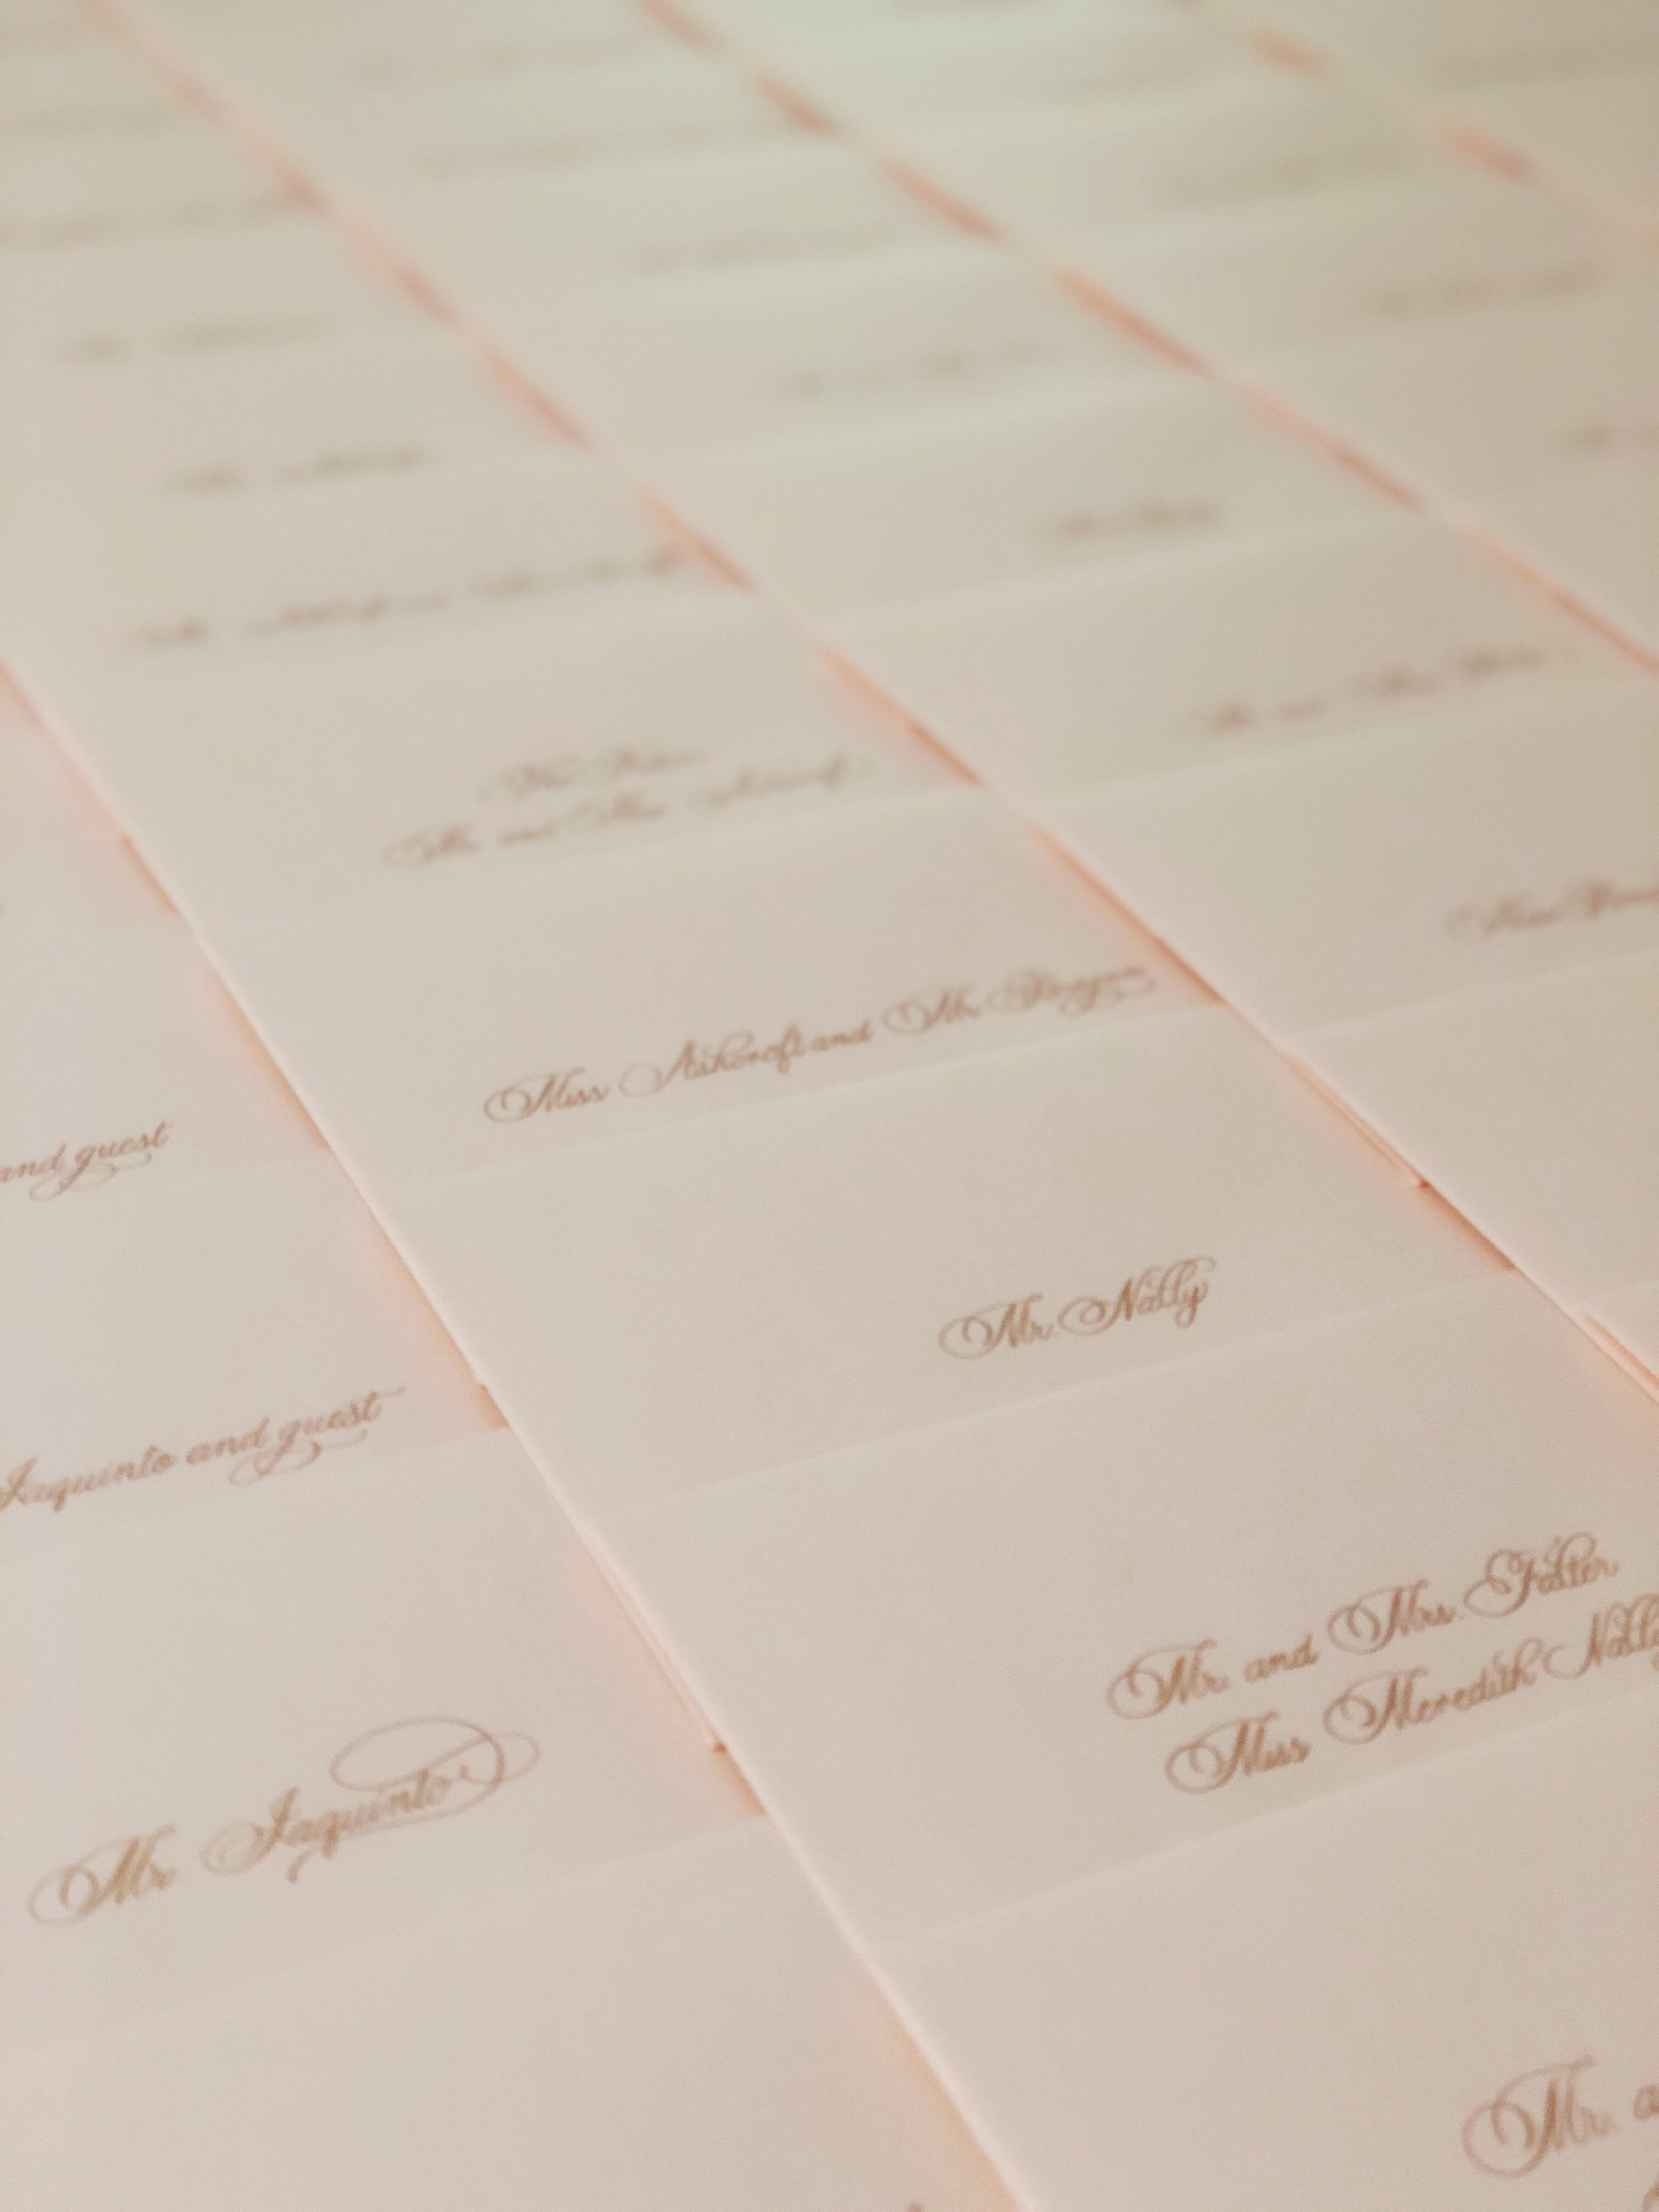 Central PA, York PA, JesSmith Designs, custom, wedding, invitations, bridal, Harrisburg, hanover, calligraphy, baltimore, wedding invitations, lancaster, gettysburg, 06-19 16.58.41.jpg